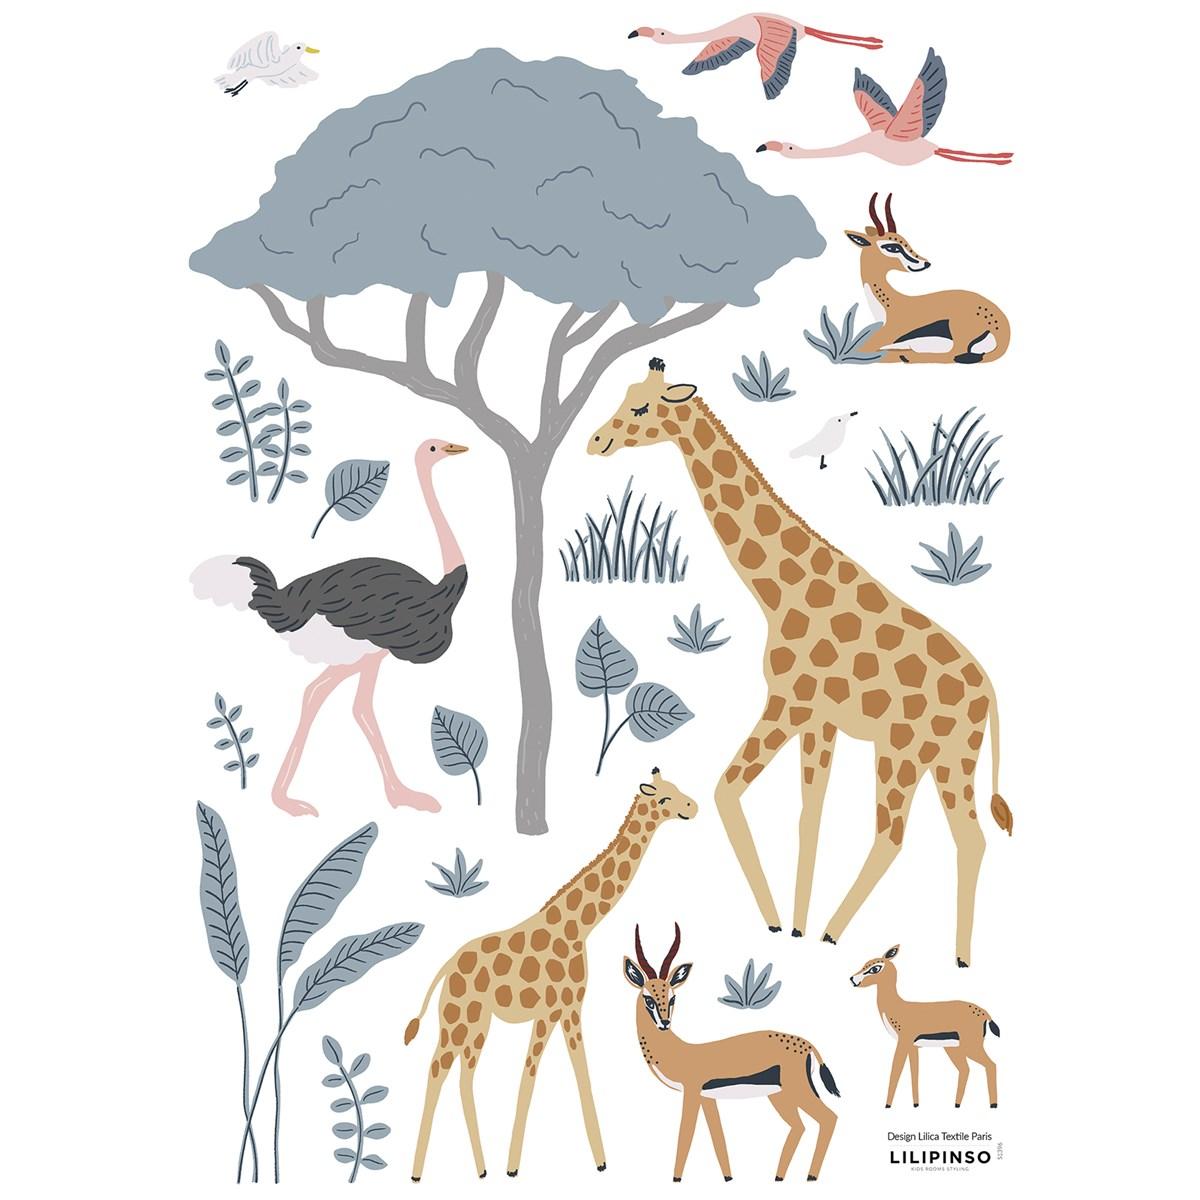 Planche de stickers animaux sauvages multicolore